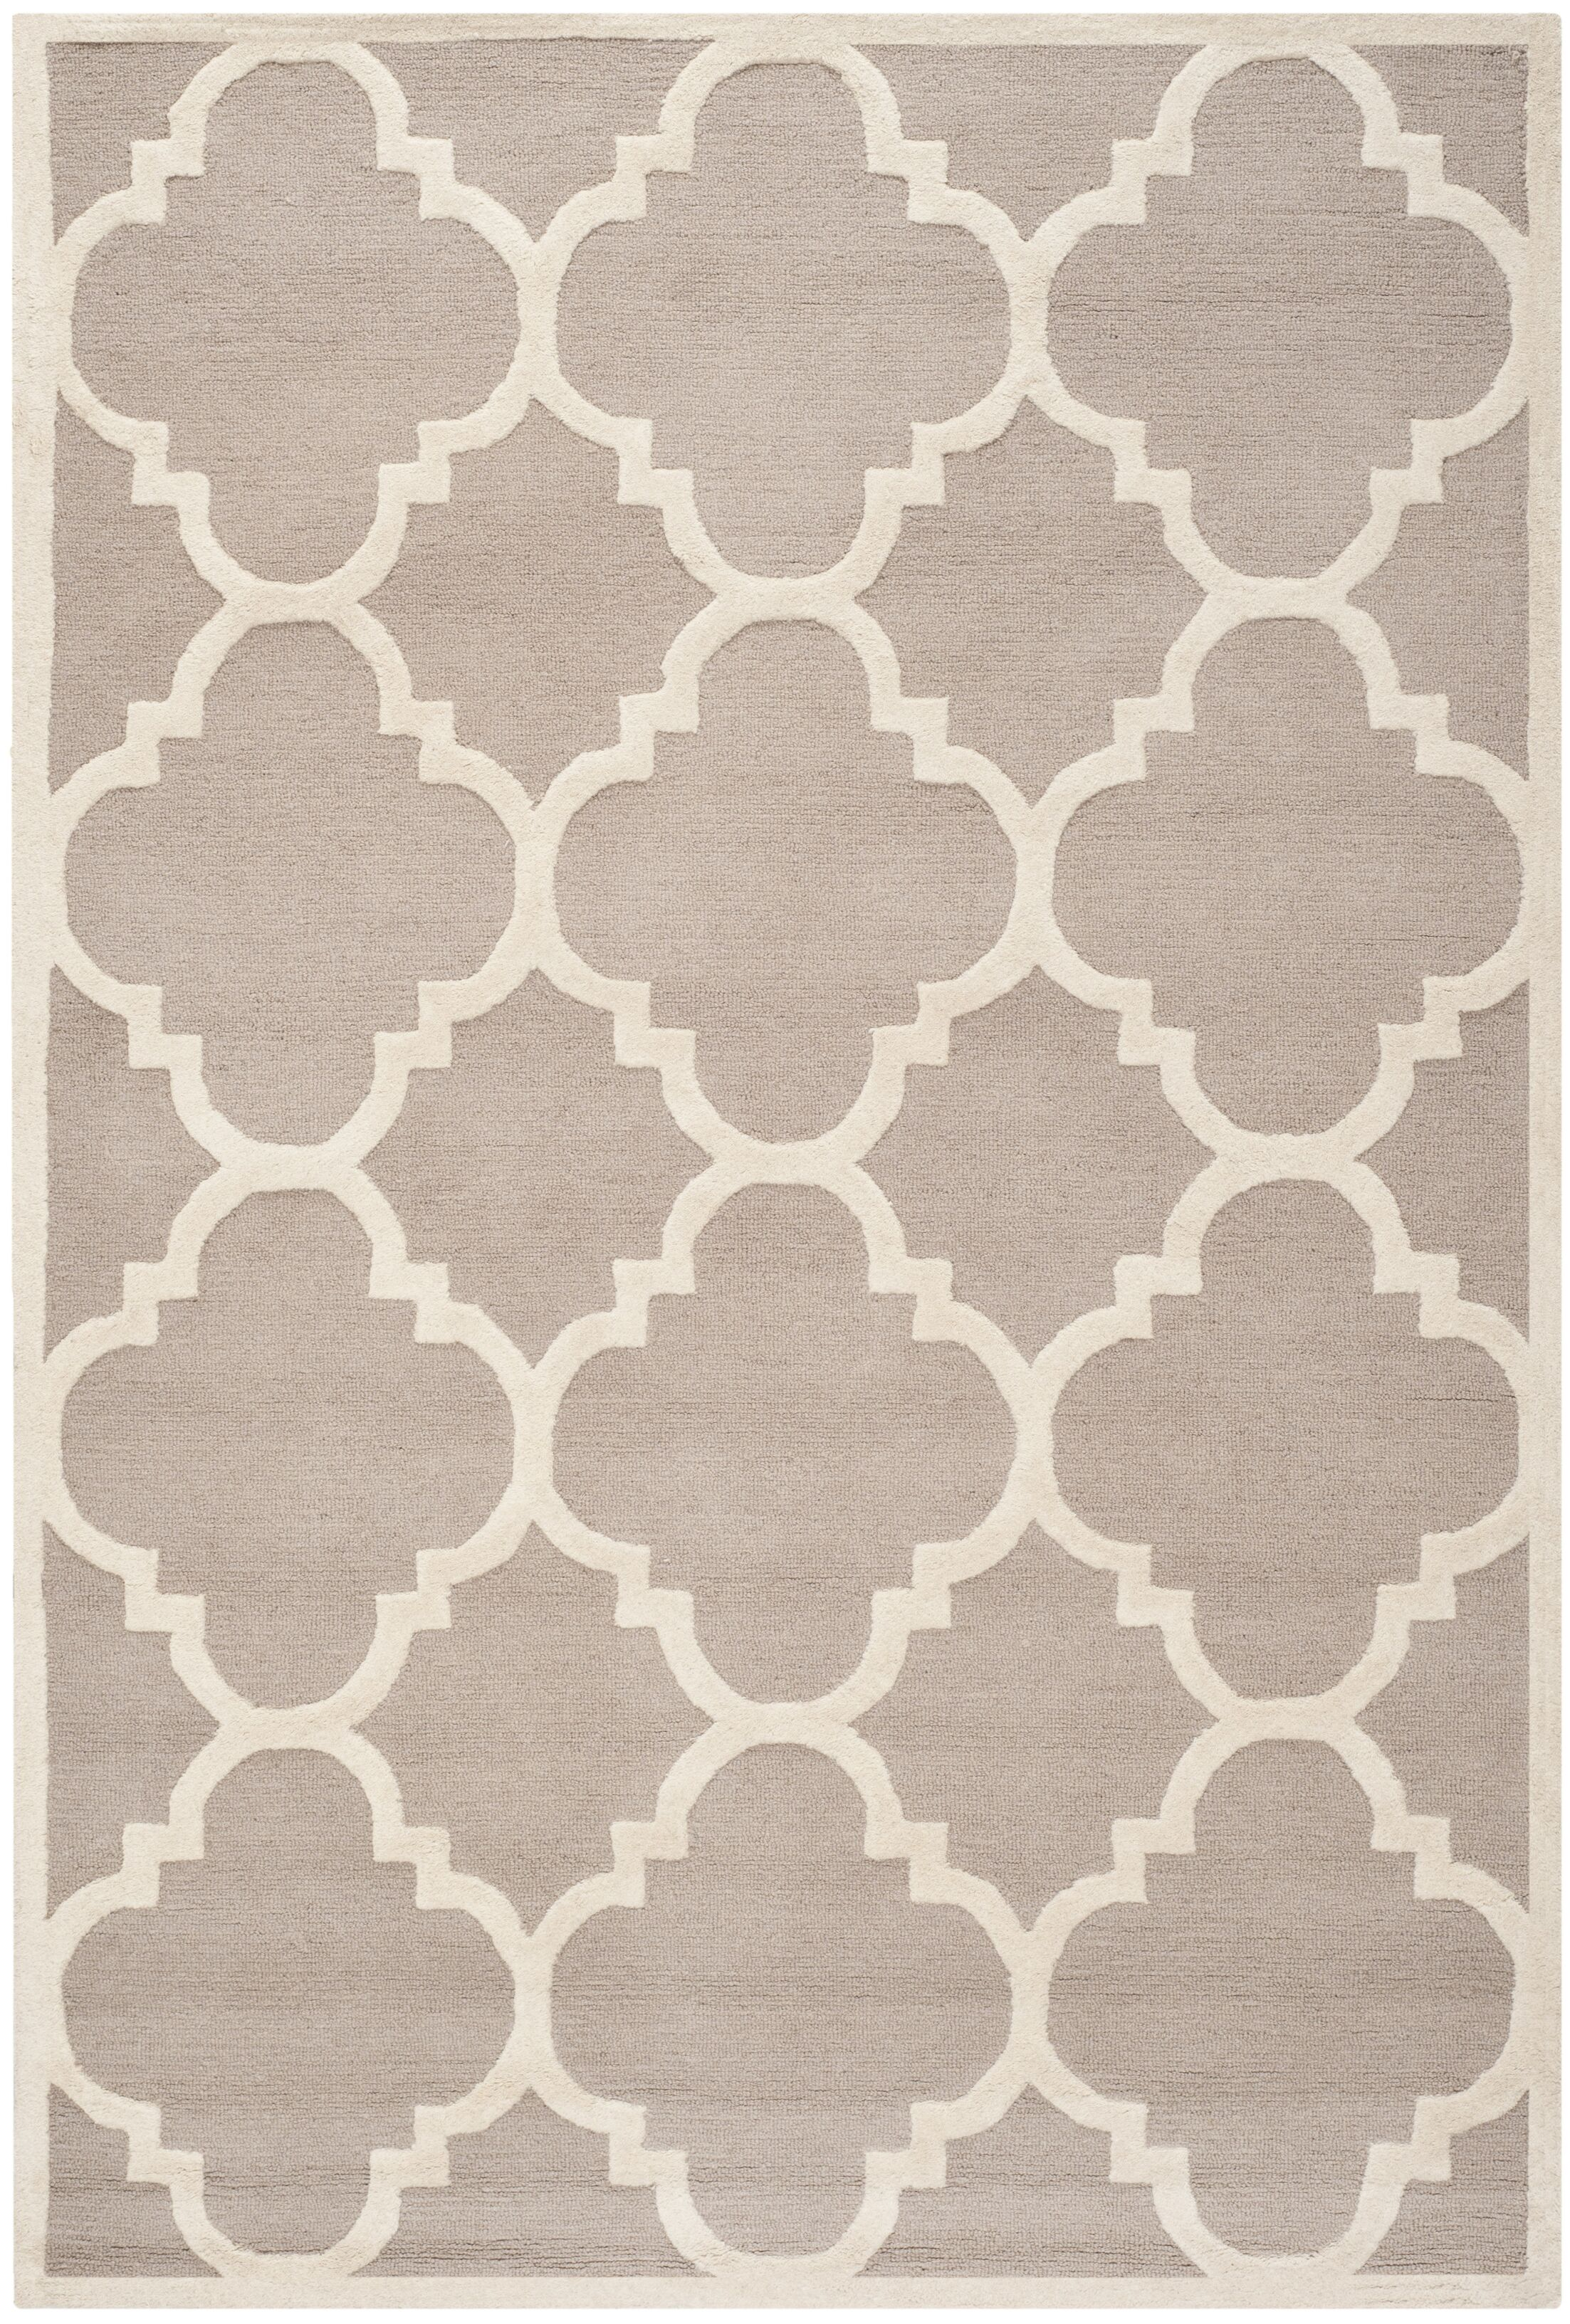 Charlenne Beige/Ivory Area Rug Rug Size: Rectangle 6' x 9'